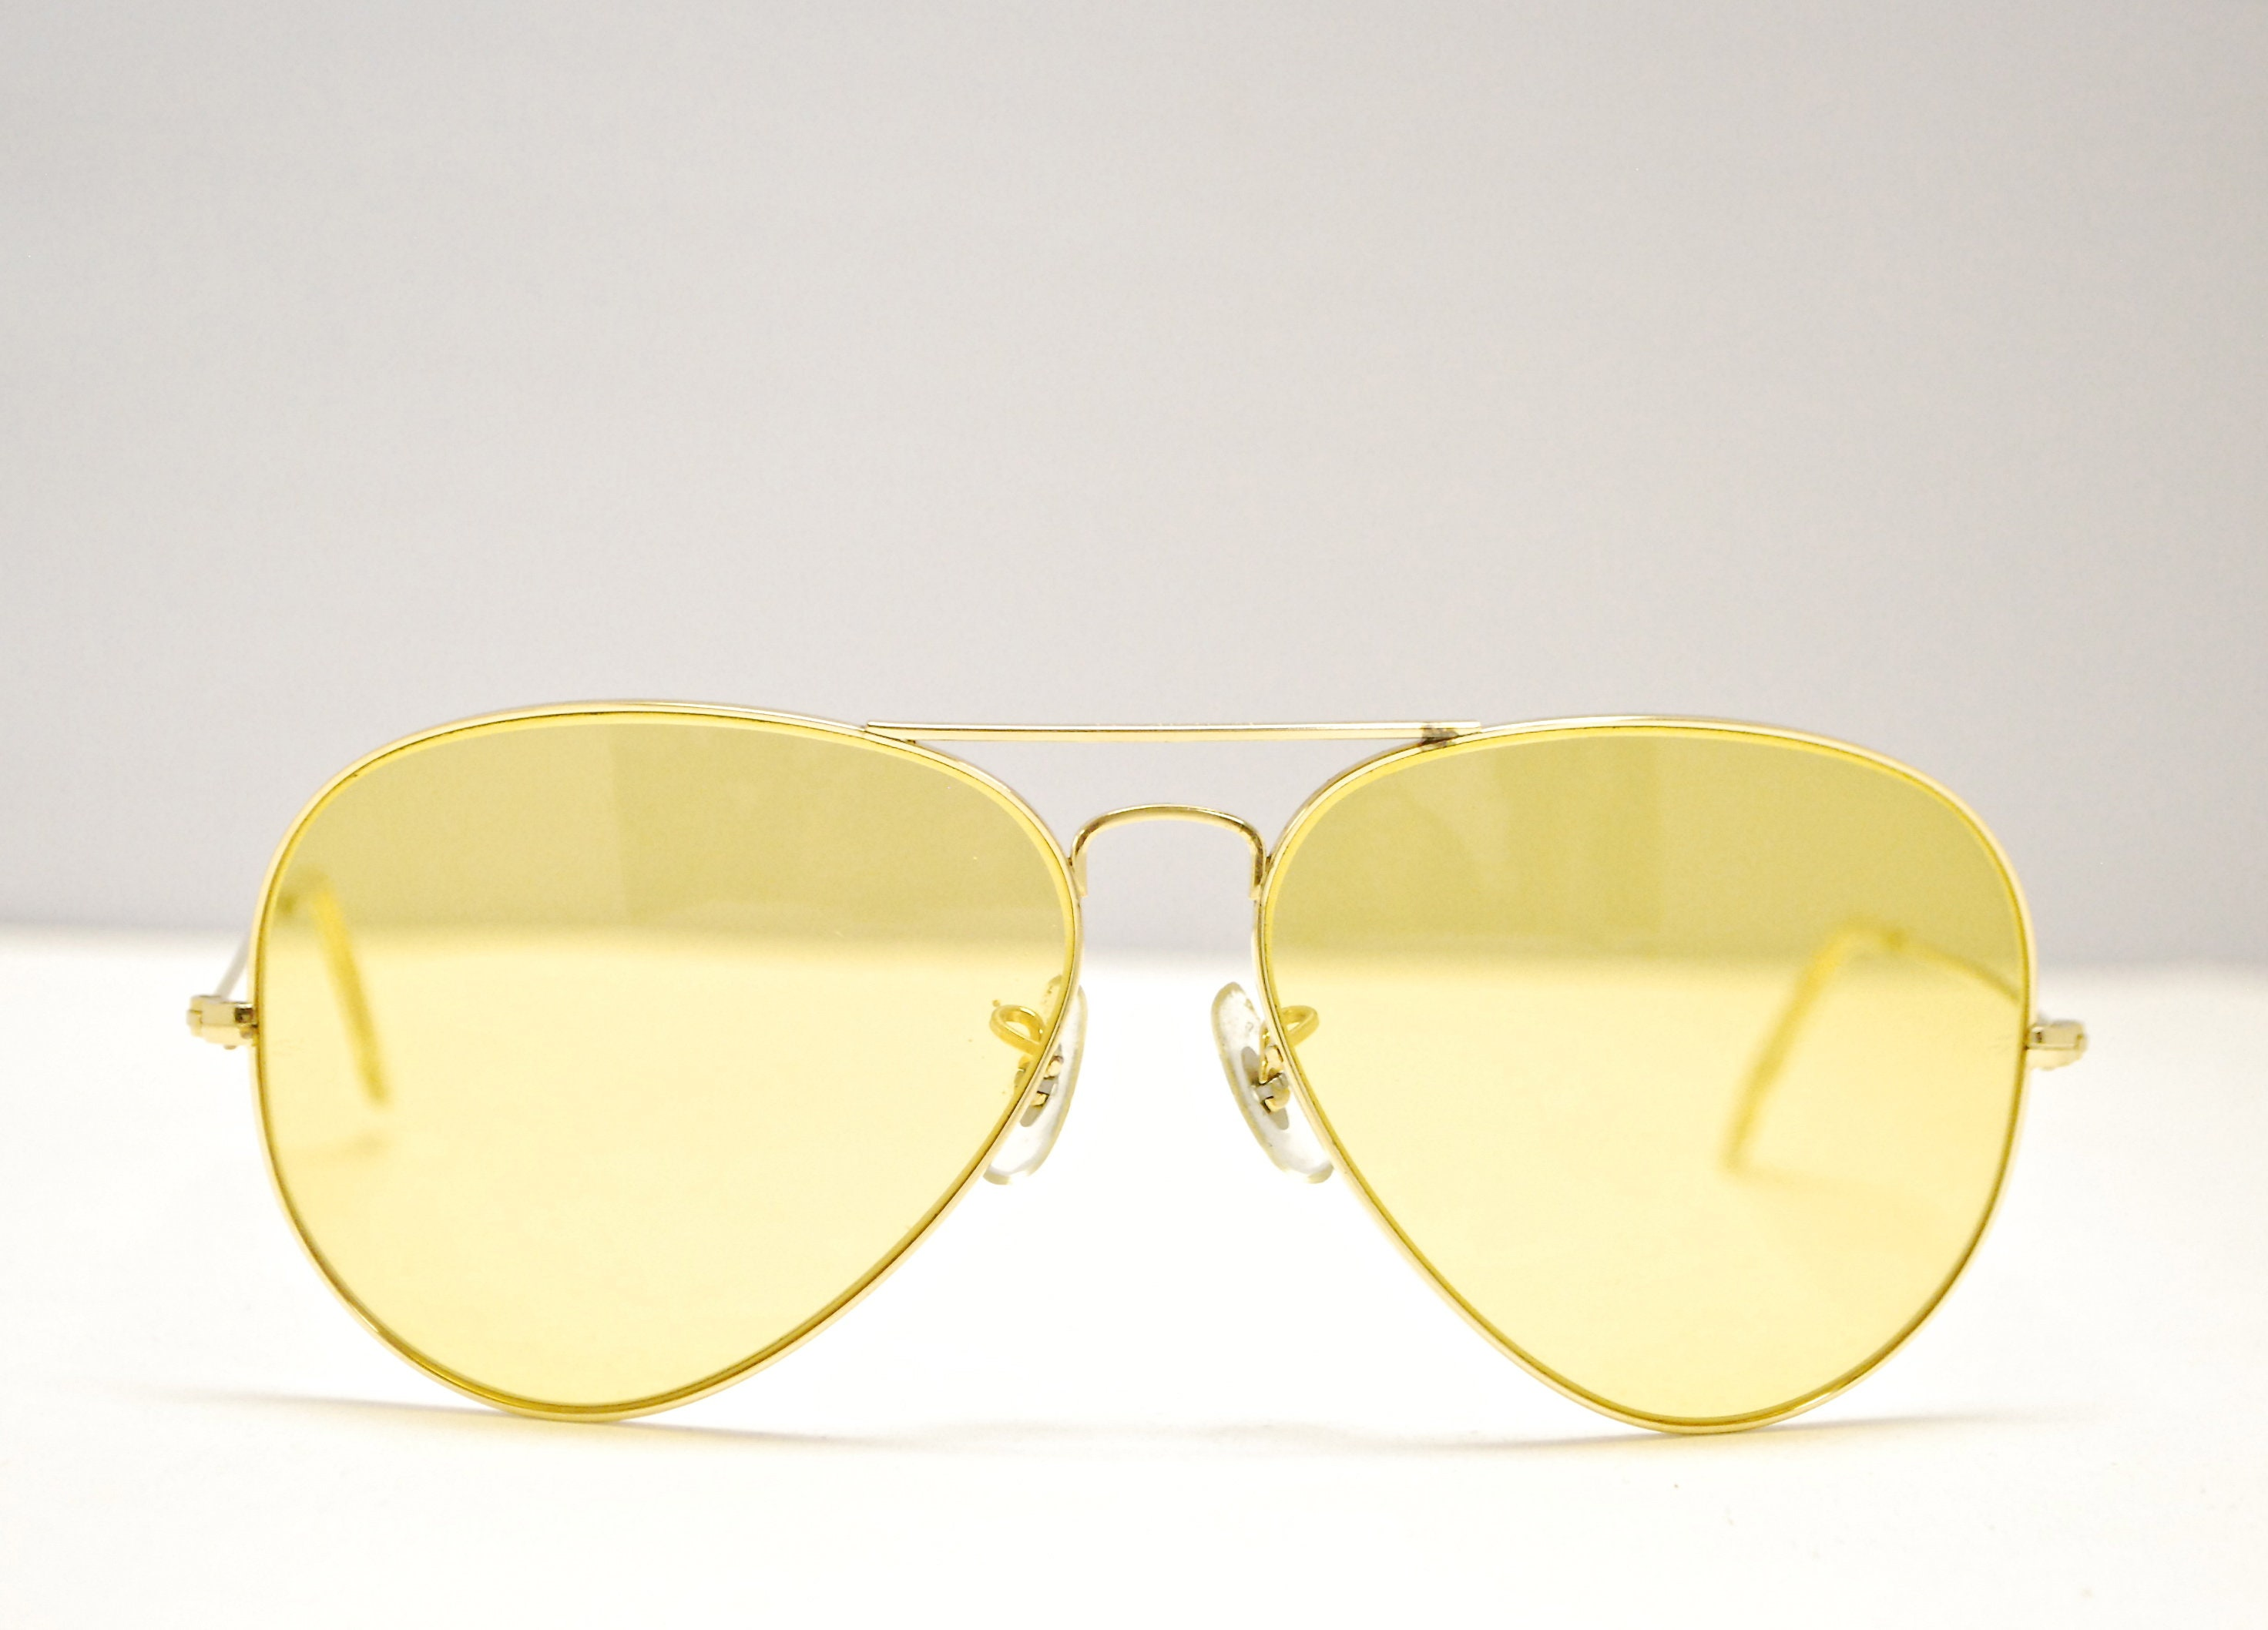 b17bff61ae Vintage RAY BAN Yellow Lens AVIATOR Sunglasses   Bausch   Lomb